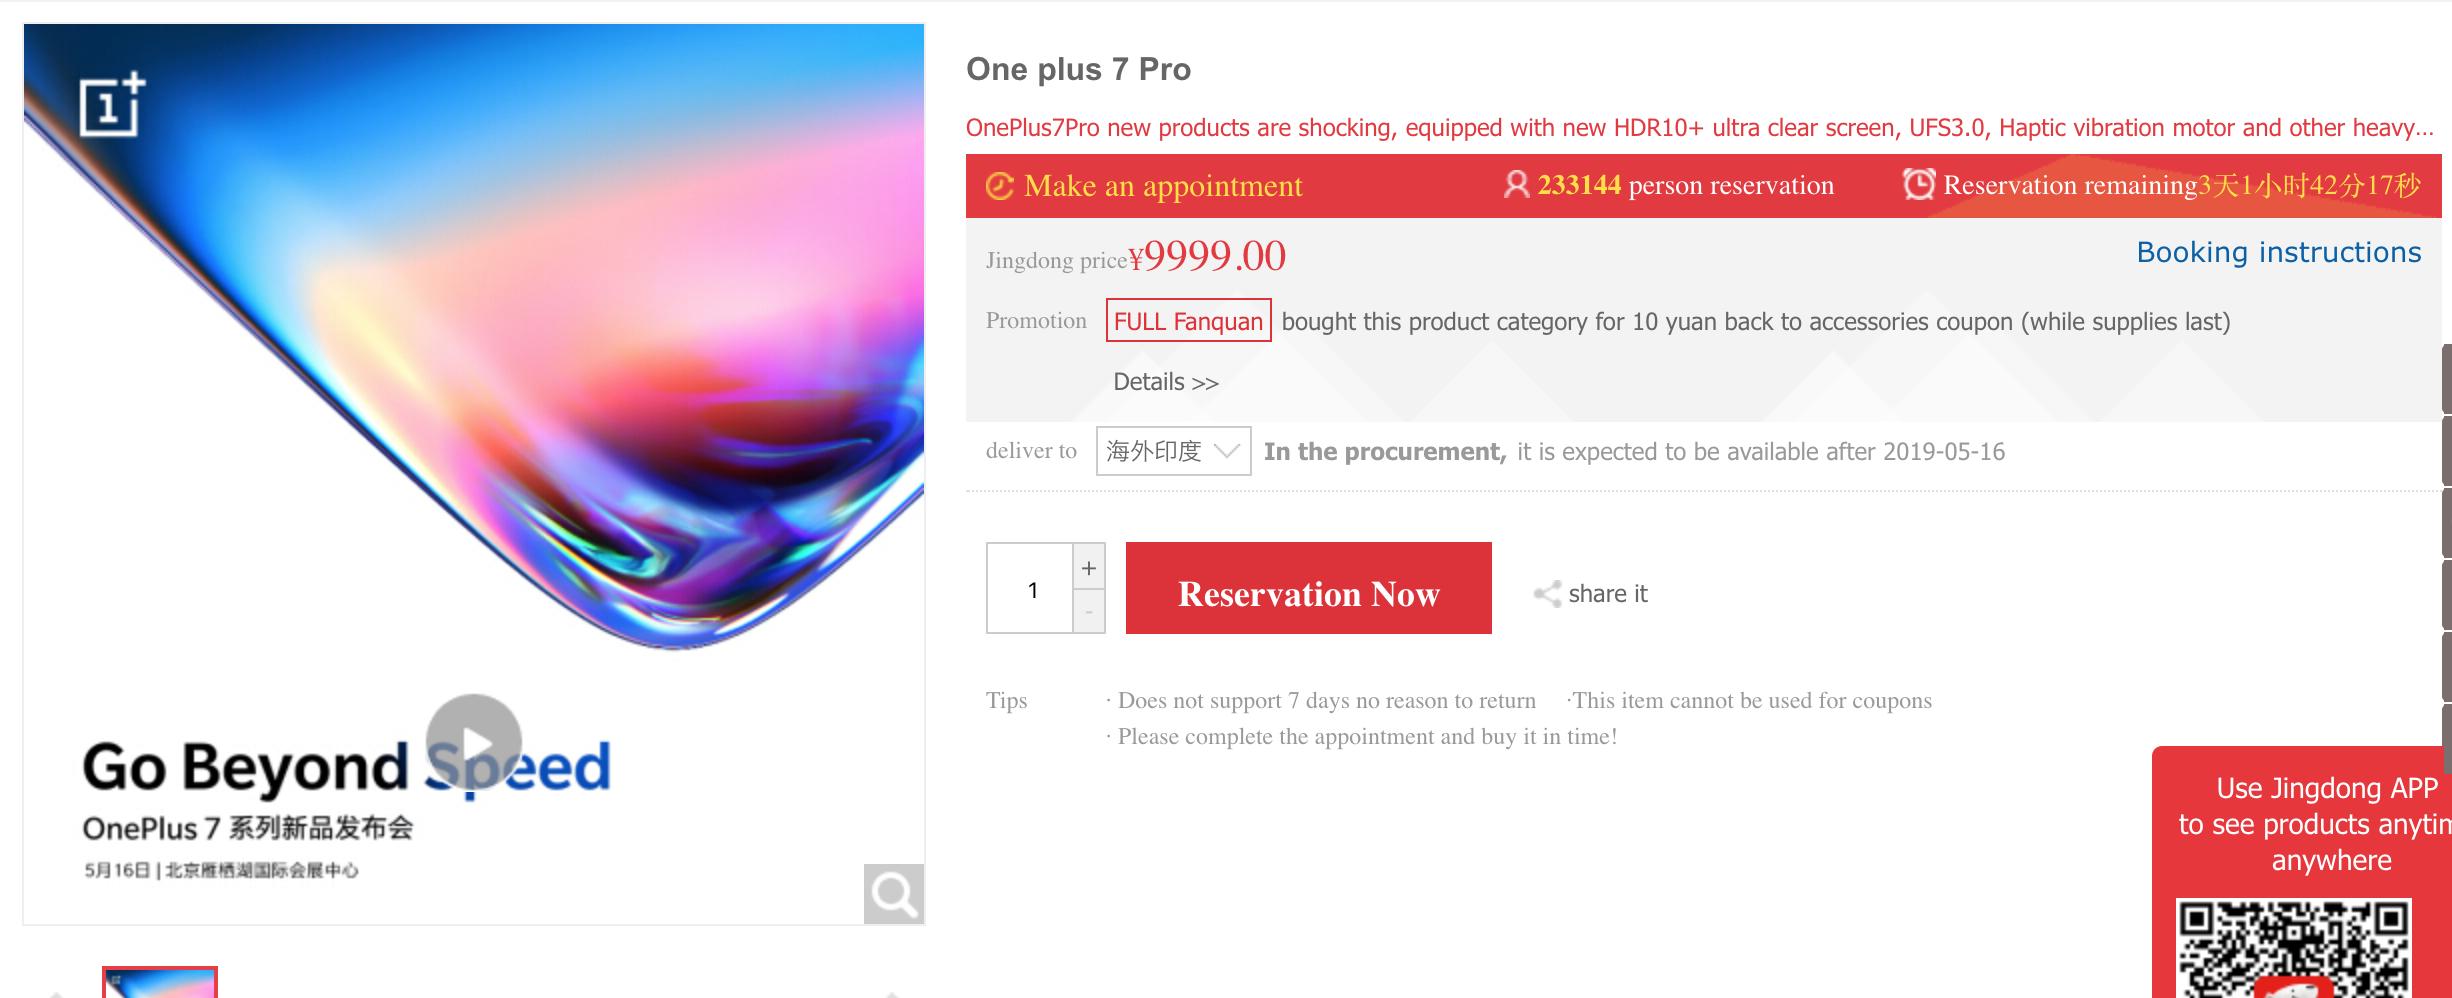 OnePlus 7 Pro JD website listing